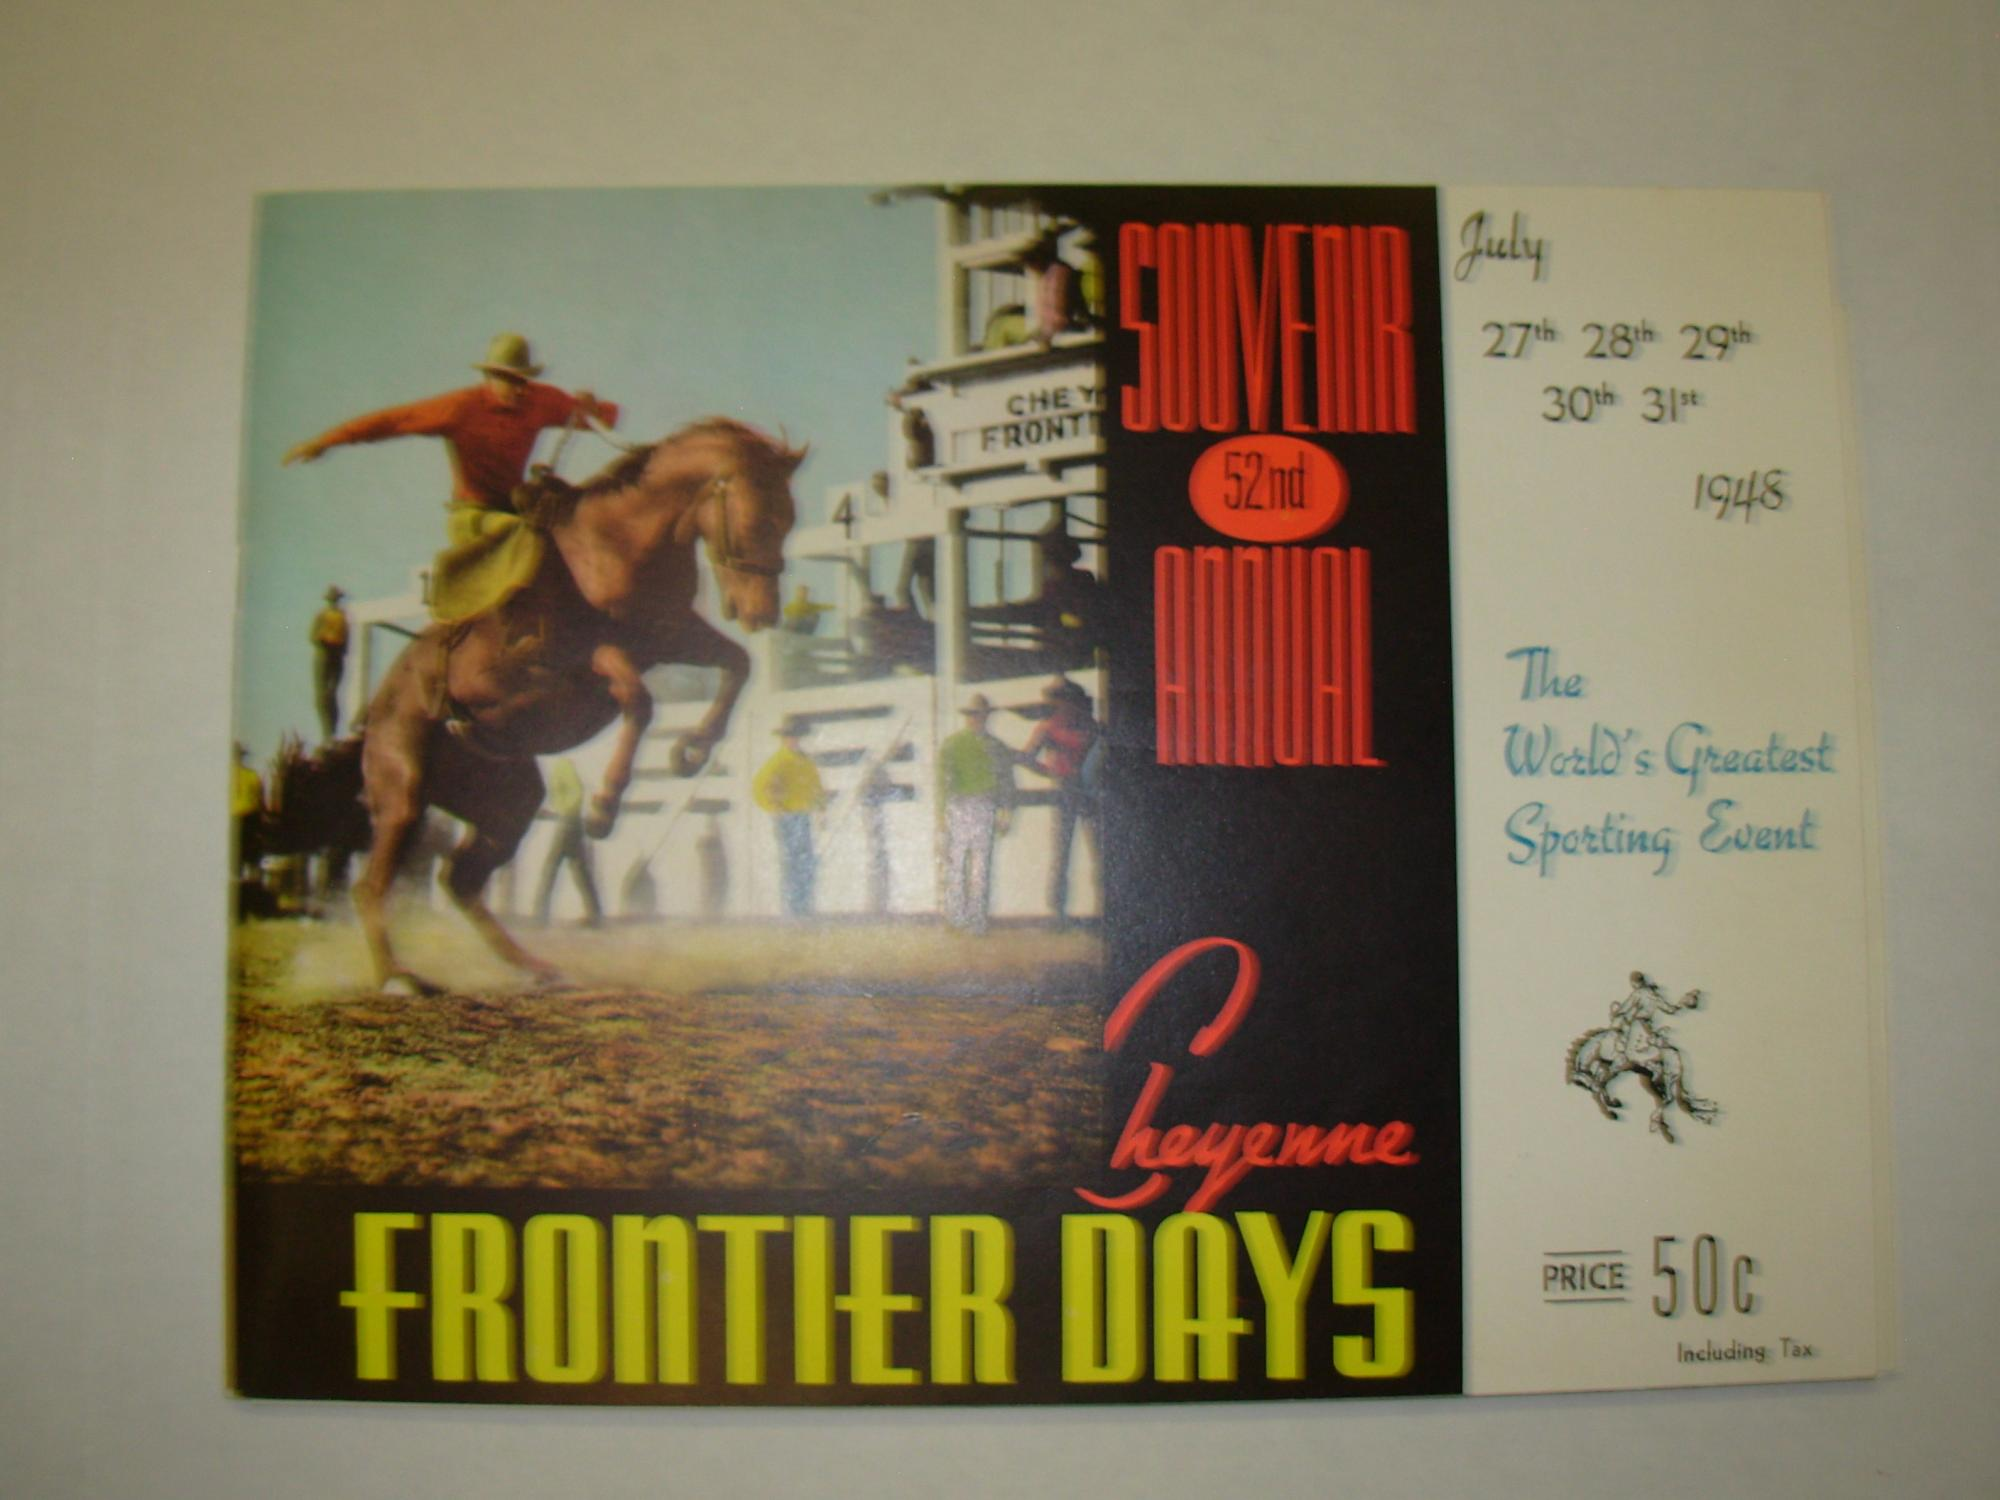 1992 Cheyenne Frontier Days Souvenir Program